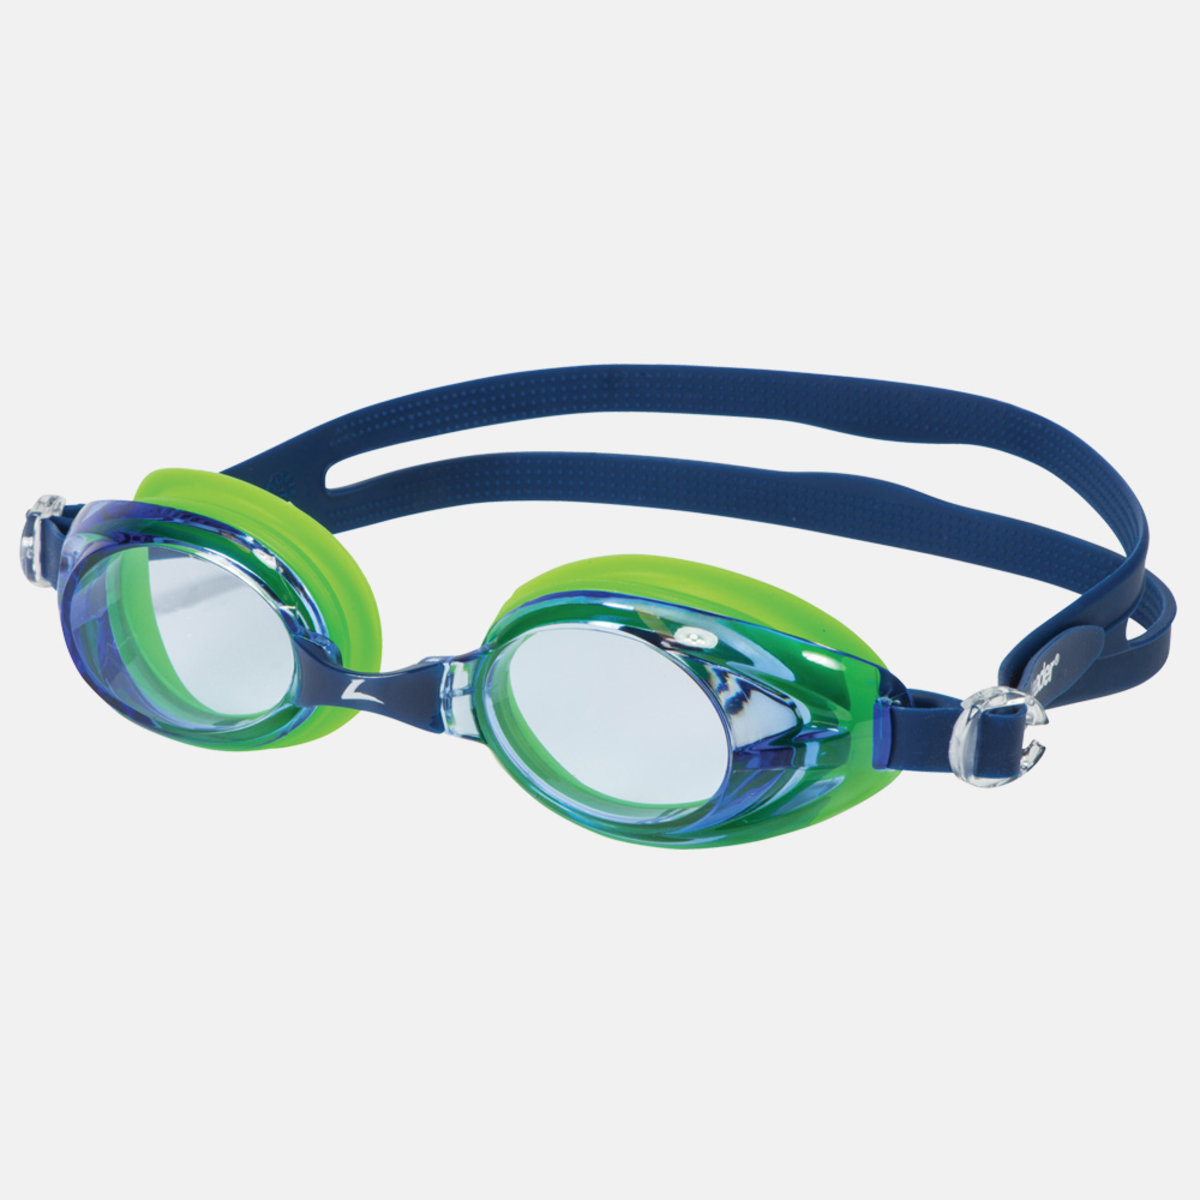 Relay Adult Swim Goggles (Intermediate level)